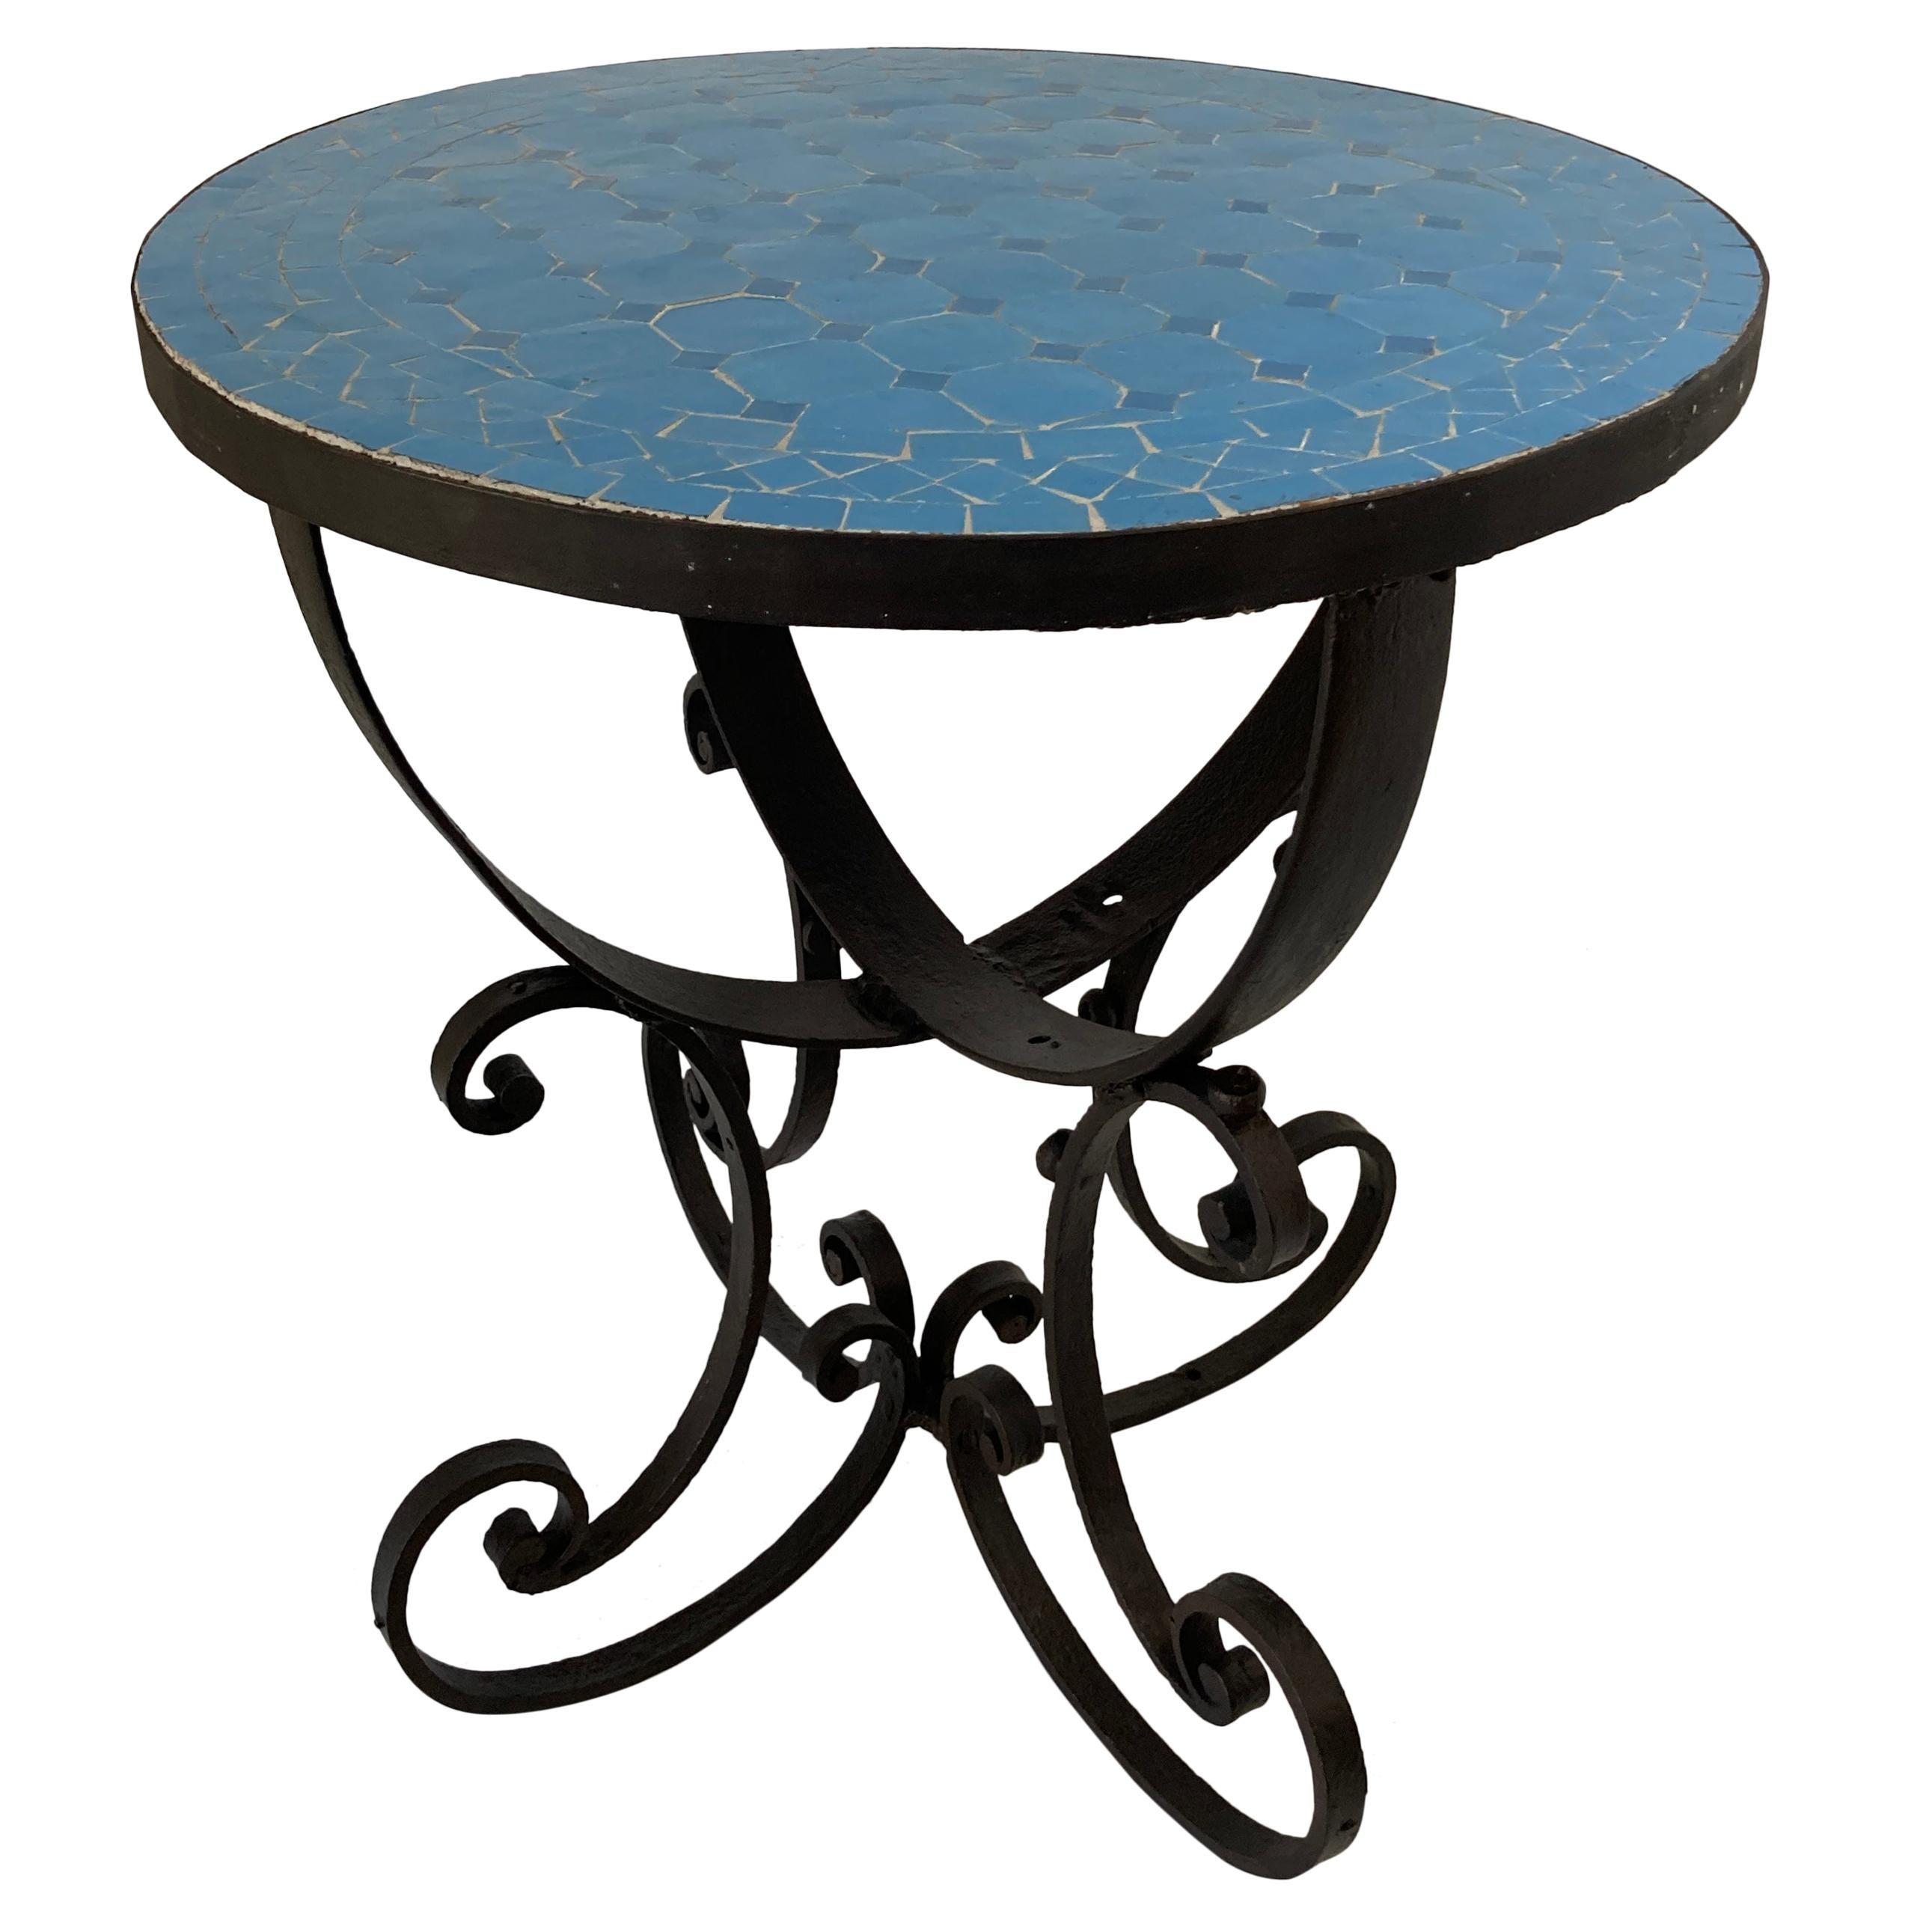 Moroccan Moorish Mosaic Tile Blue Color Side Table on Iron Base